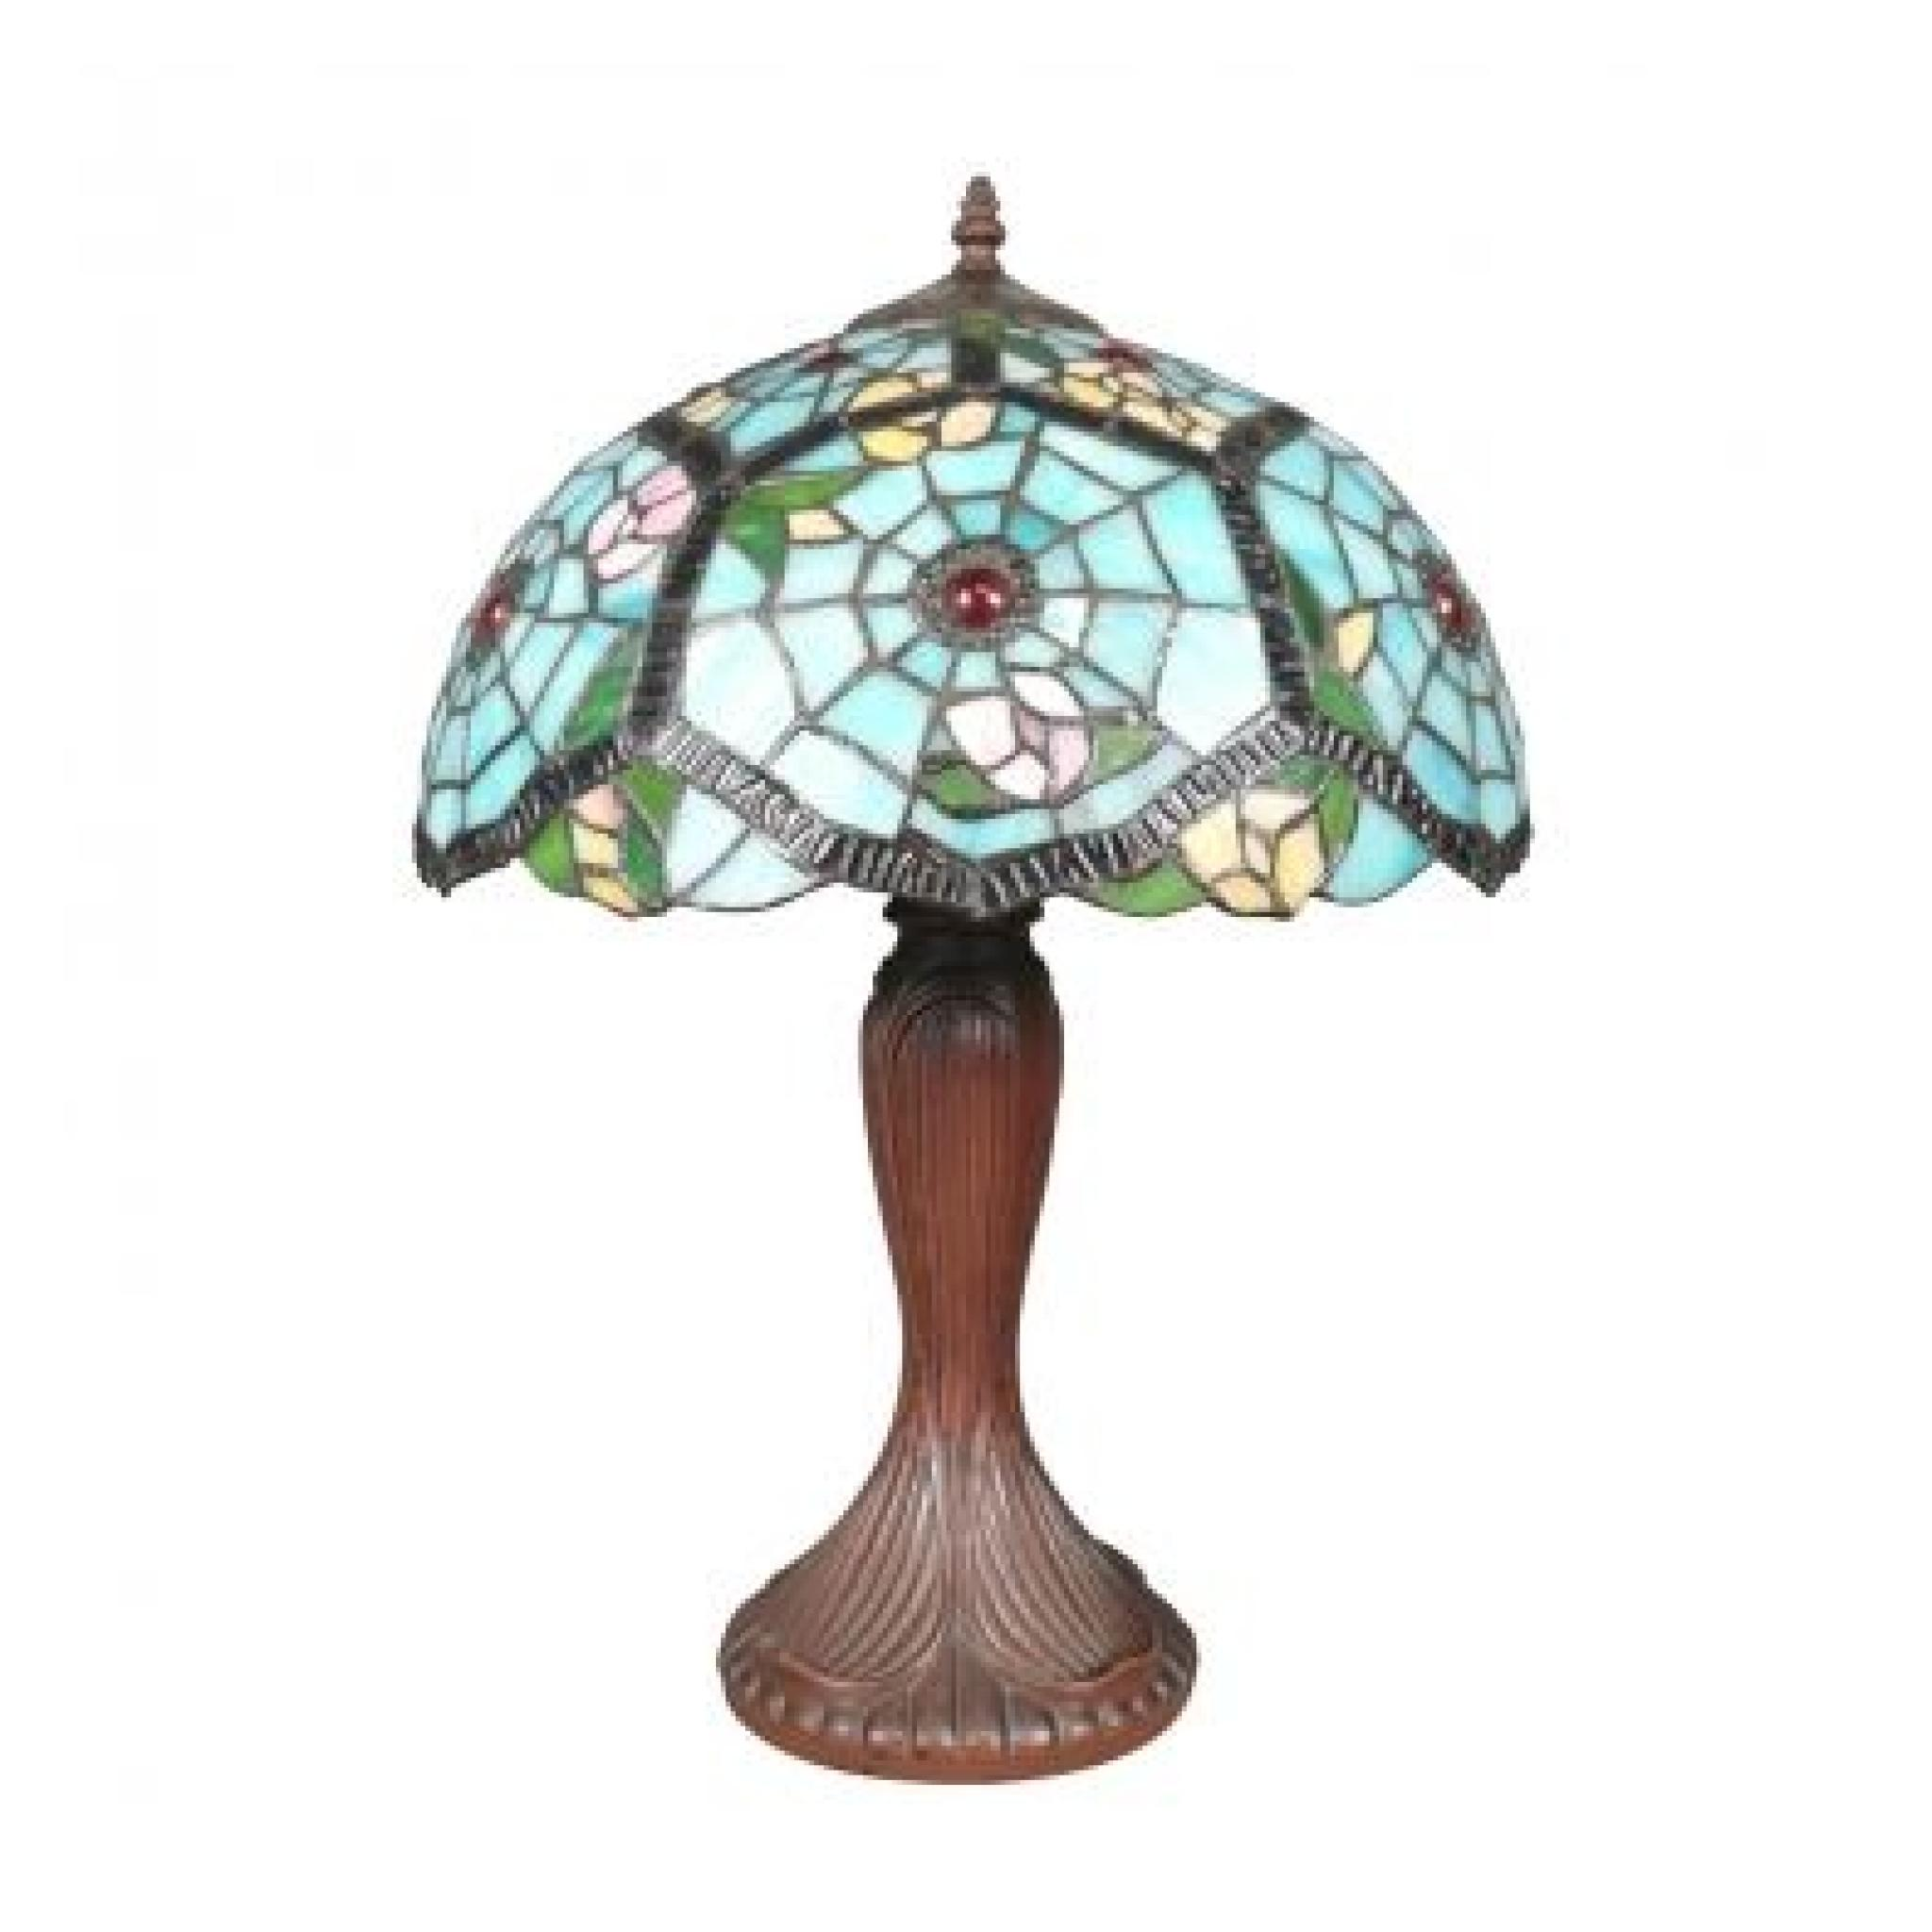 lampe tiffany achat vente lampe a poser pas cher. Black Bedroom Furniture Sets. Home Design Ideas